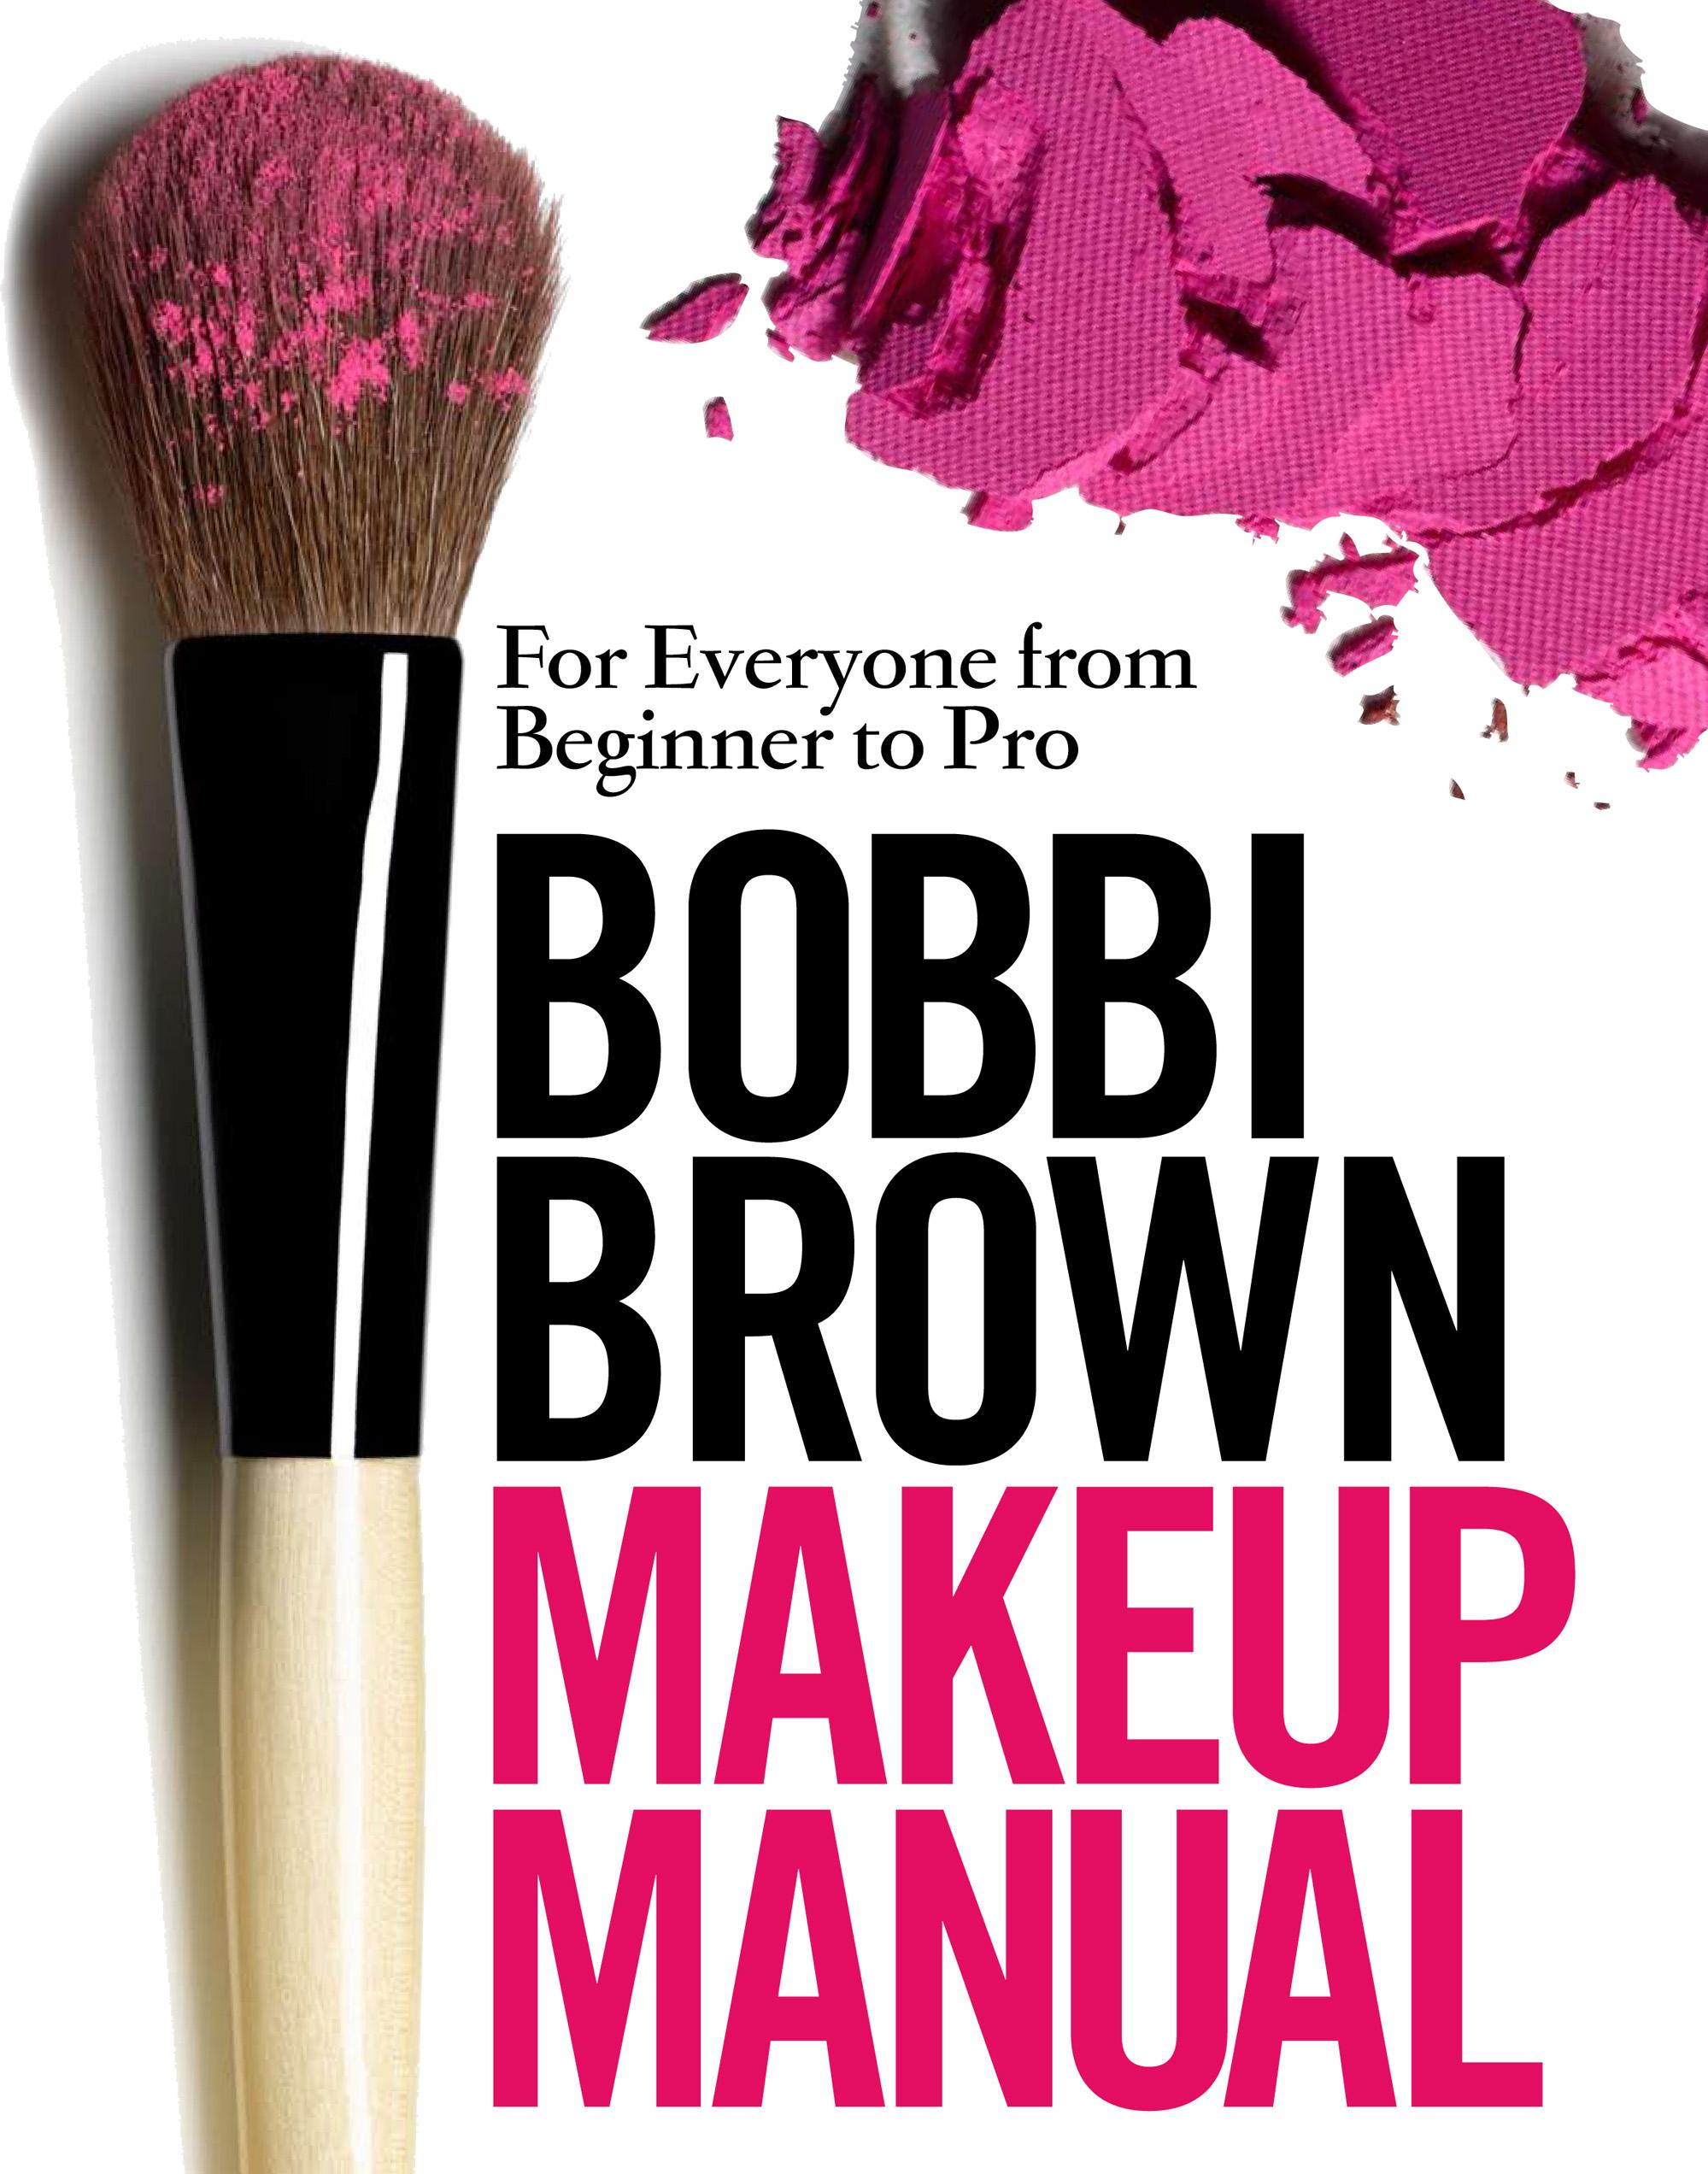 bobbi-brown-makeup-manual